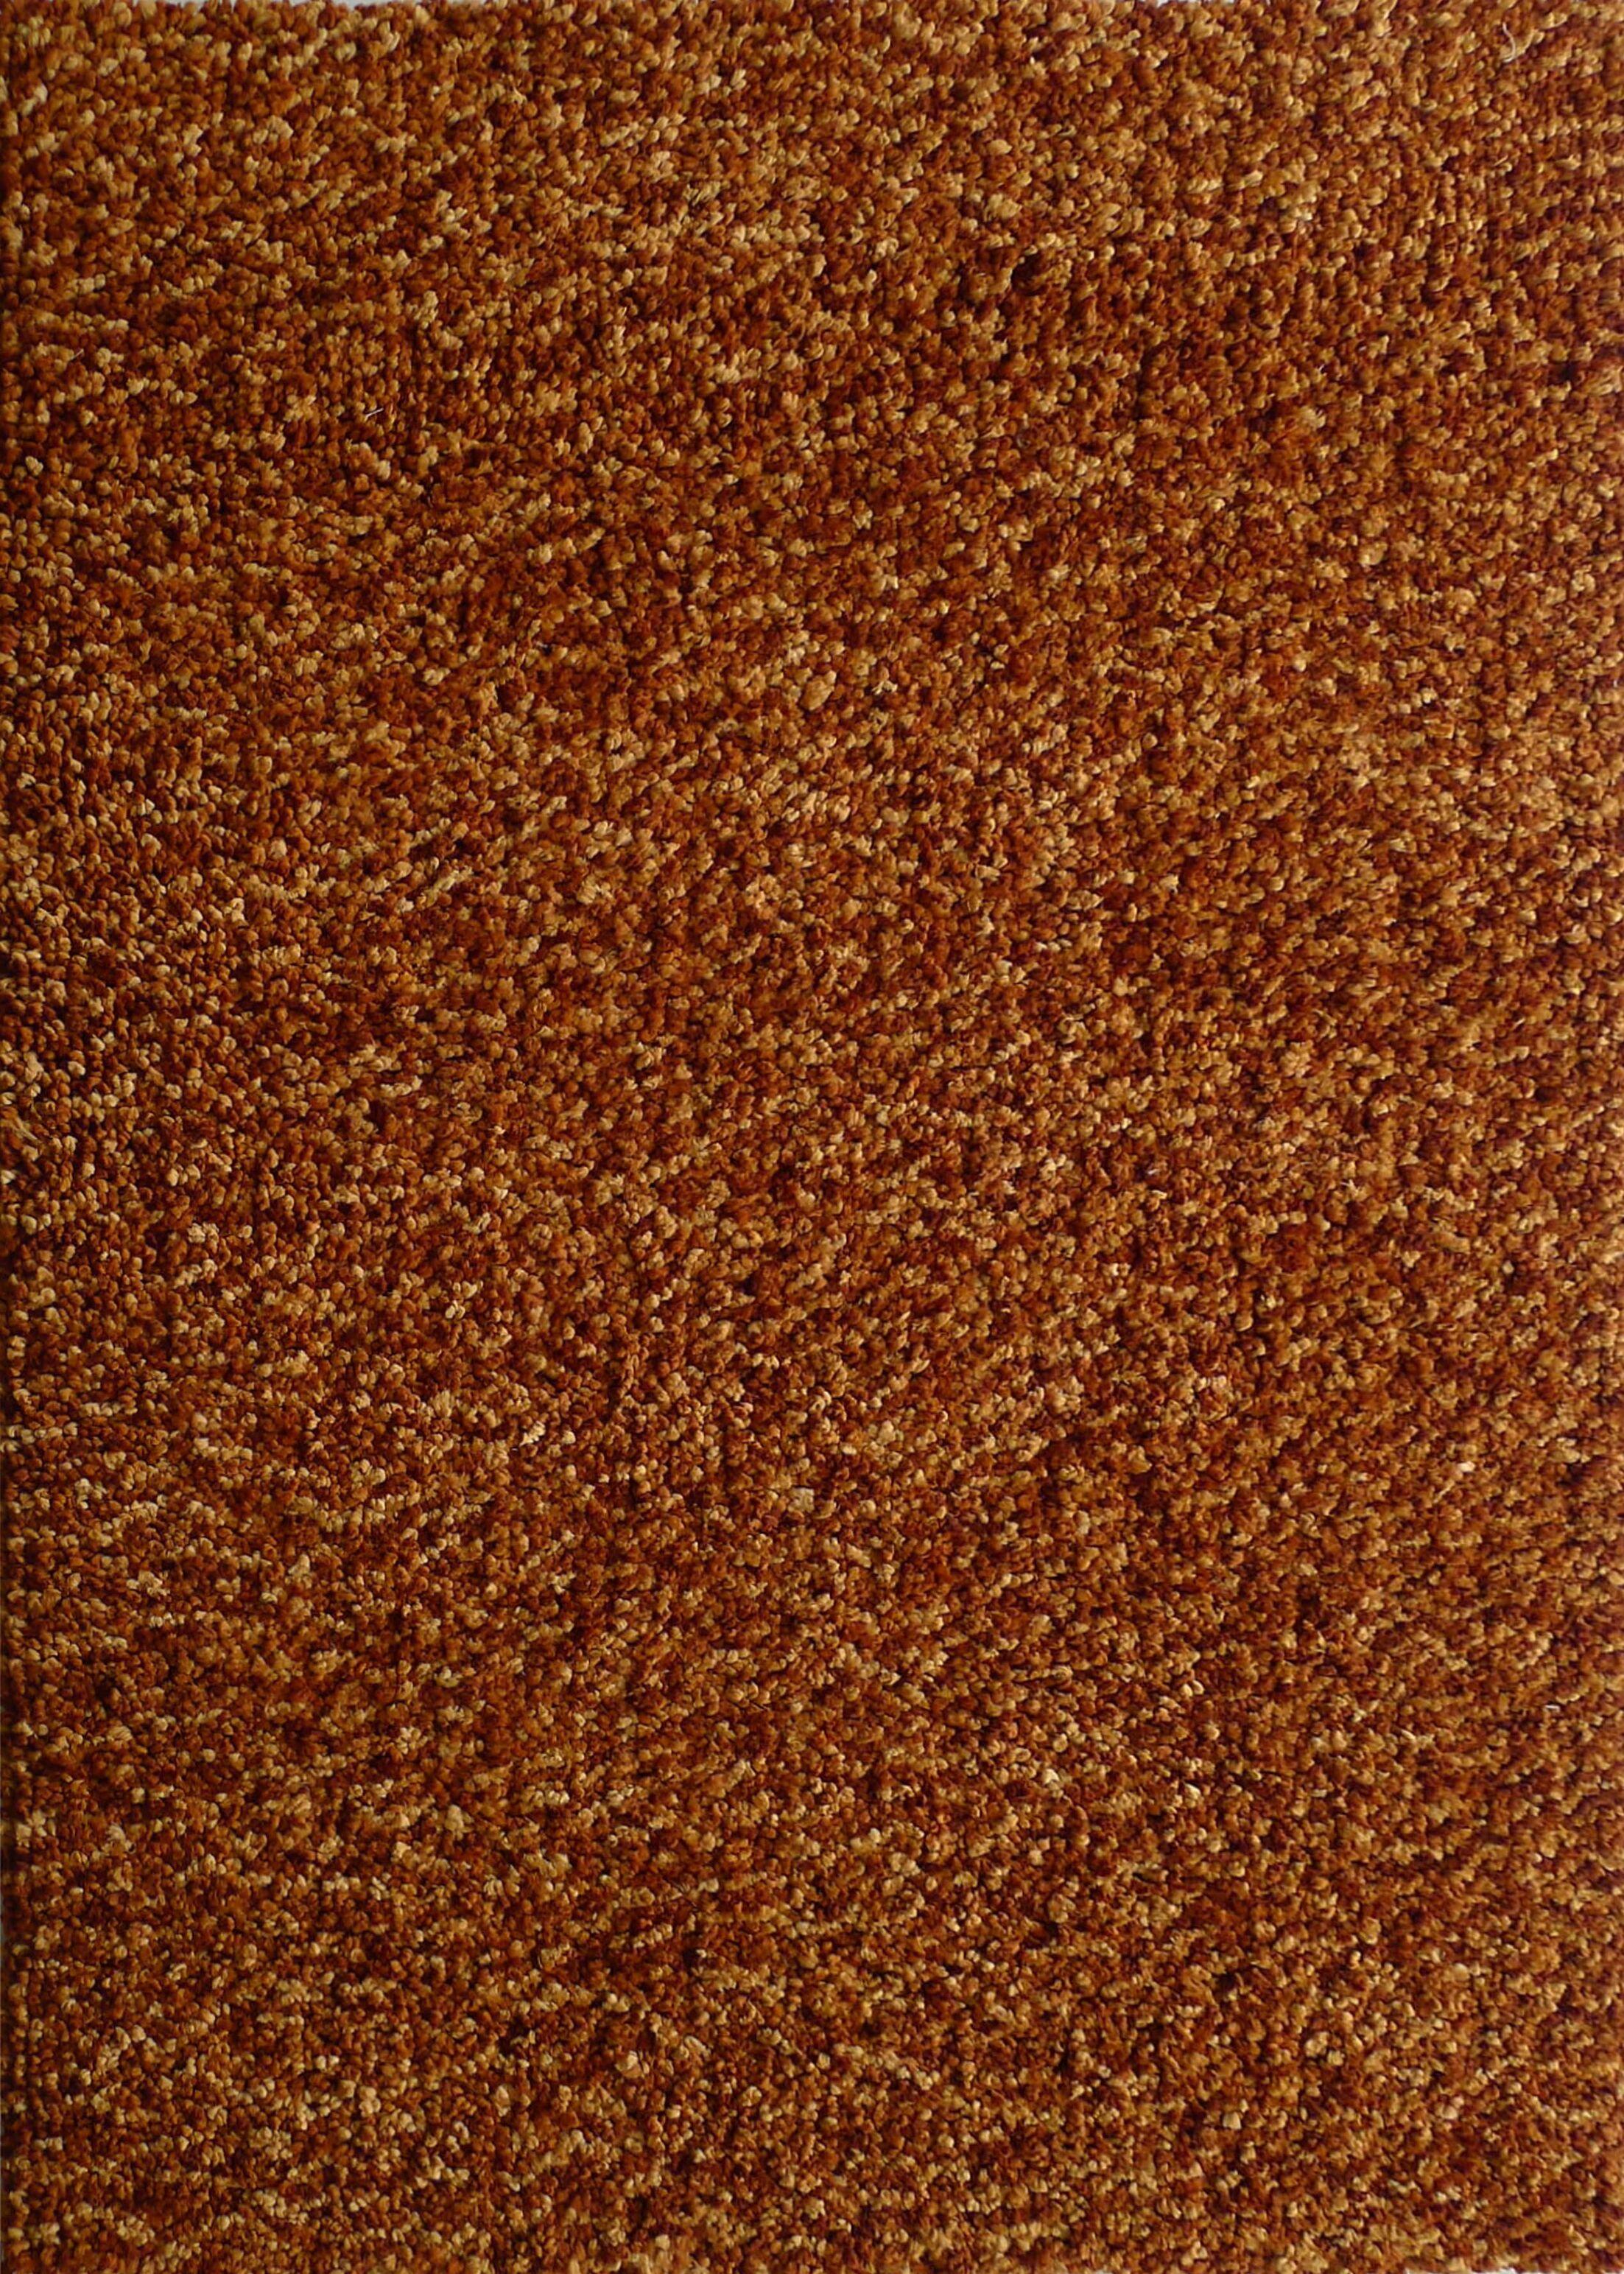 Harmony 2 Toned Terra Cotta Shag Area Rug Rug Size: 8' x 10'